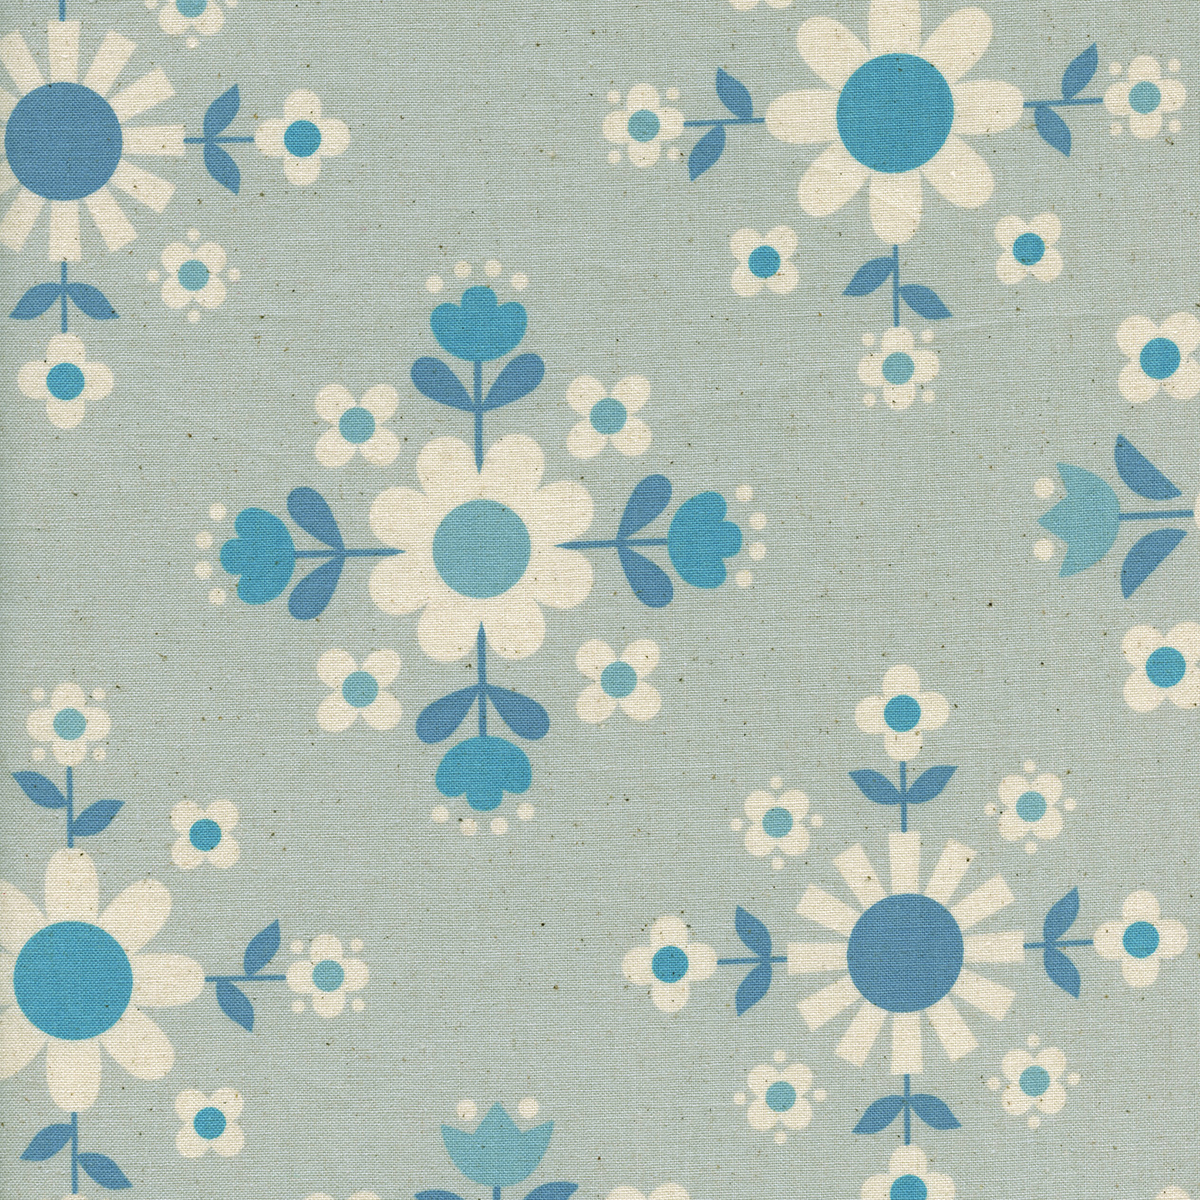 3057-2.Welsummer.Florametry.Ice.UNB